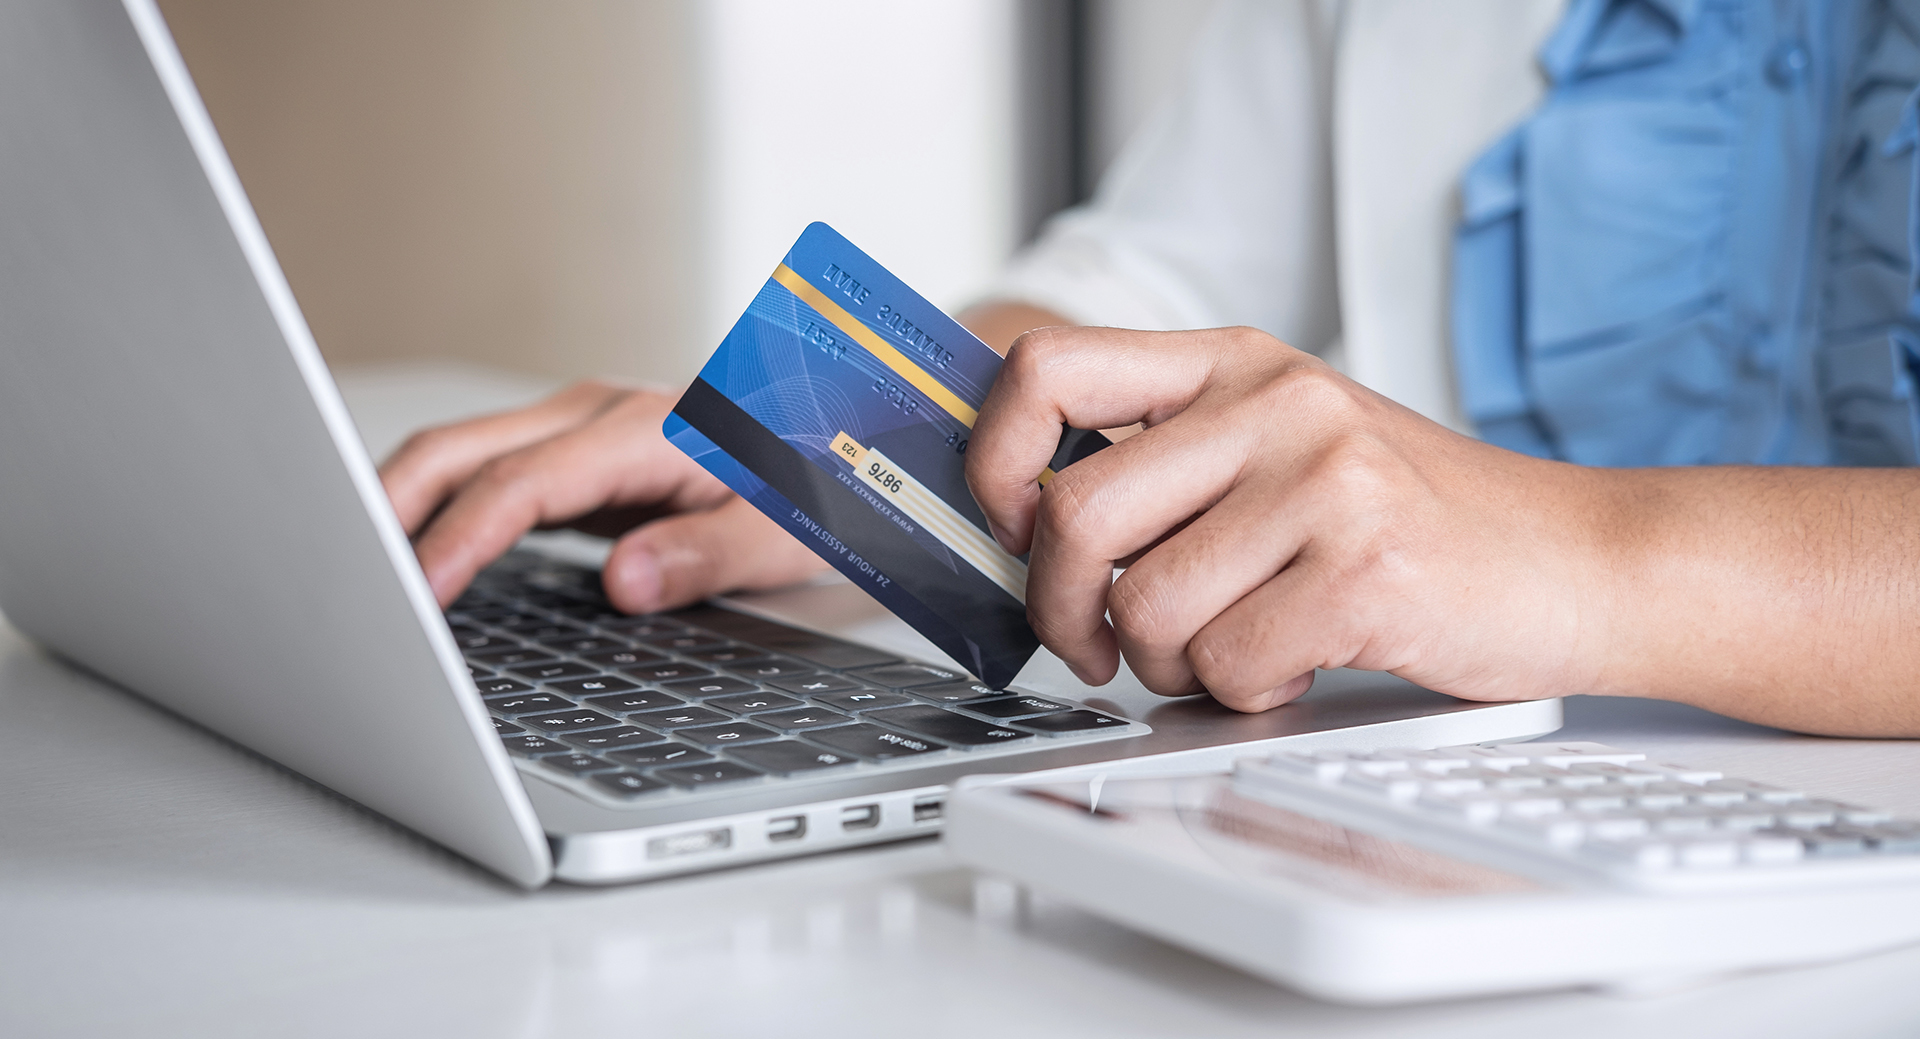 Future of Digital Banking